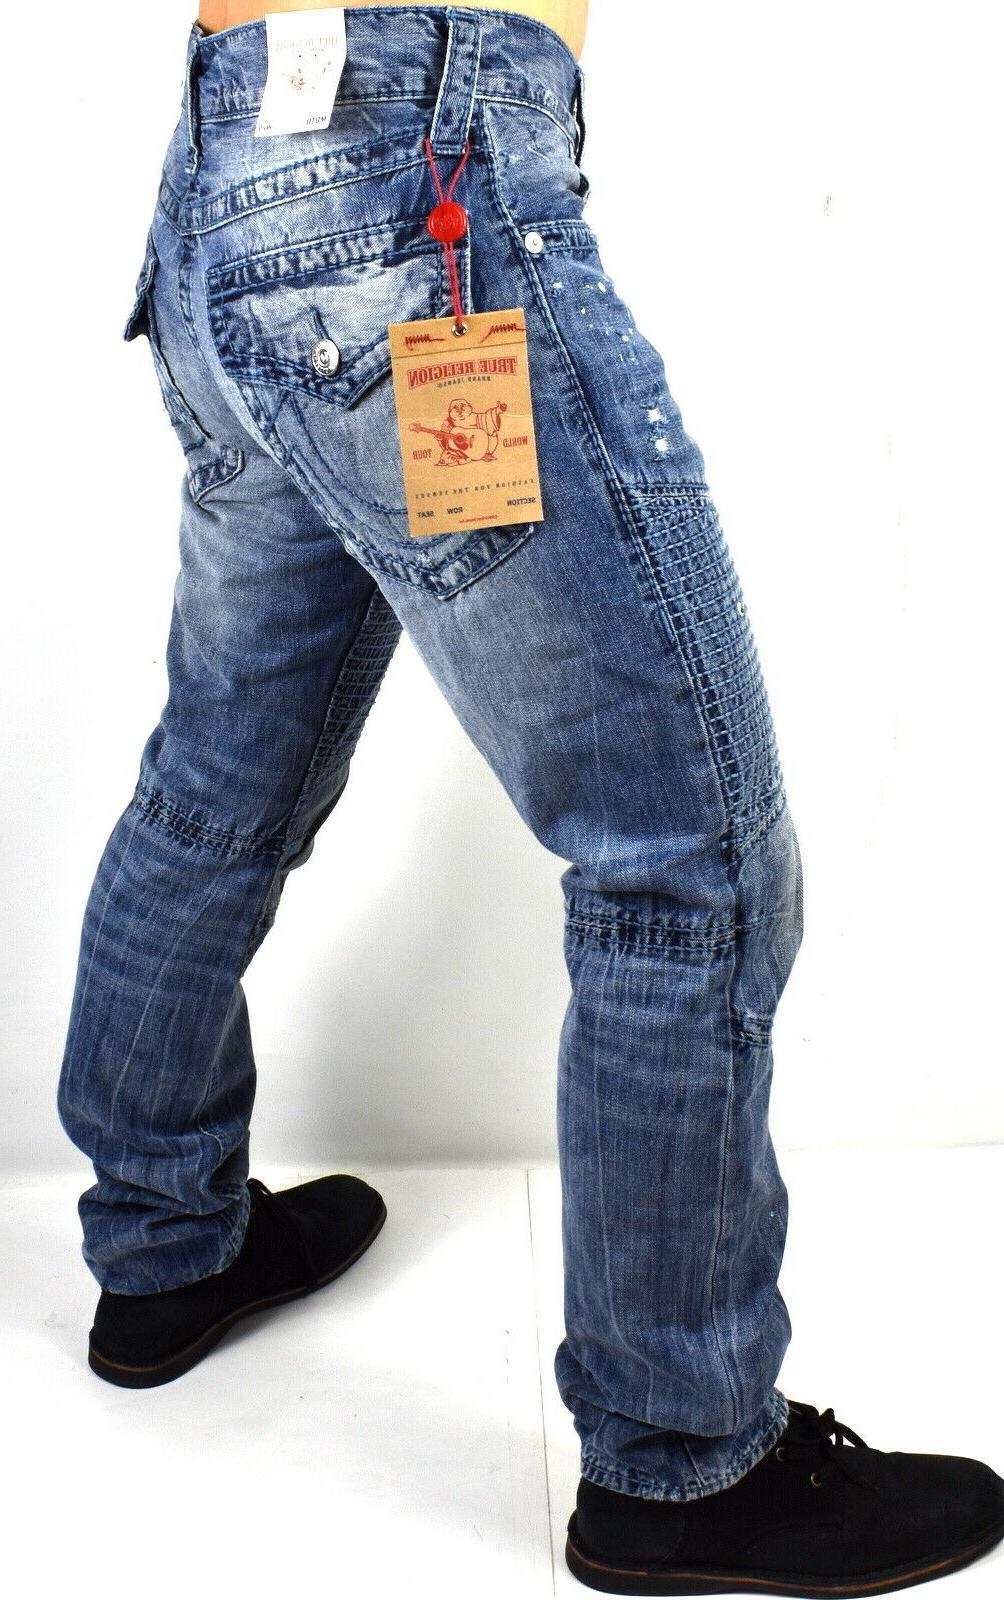 True Men's Slim Brand Jeans